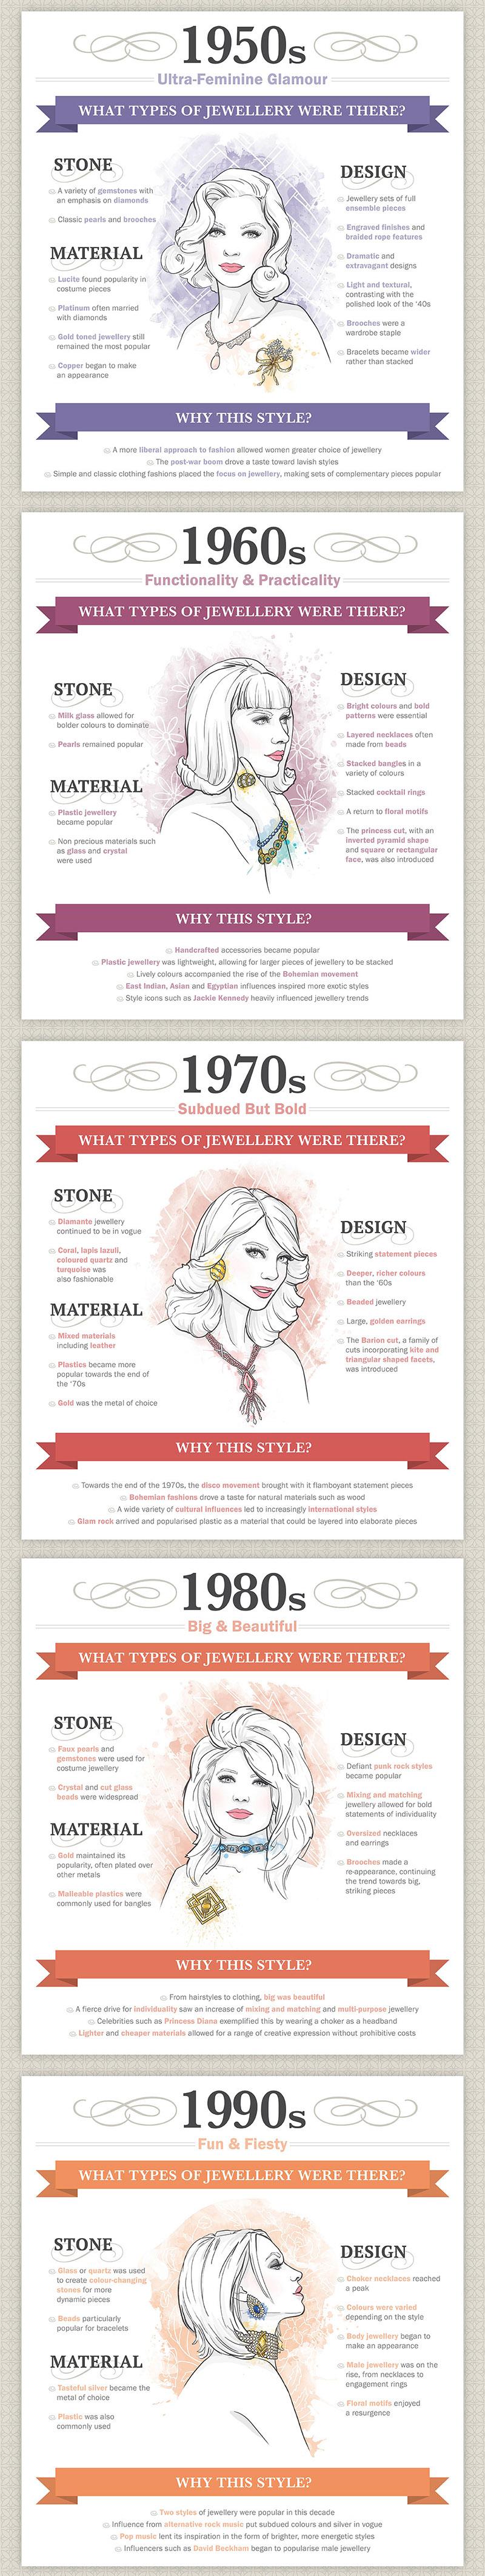 Jewellery trends throughtime